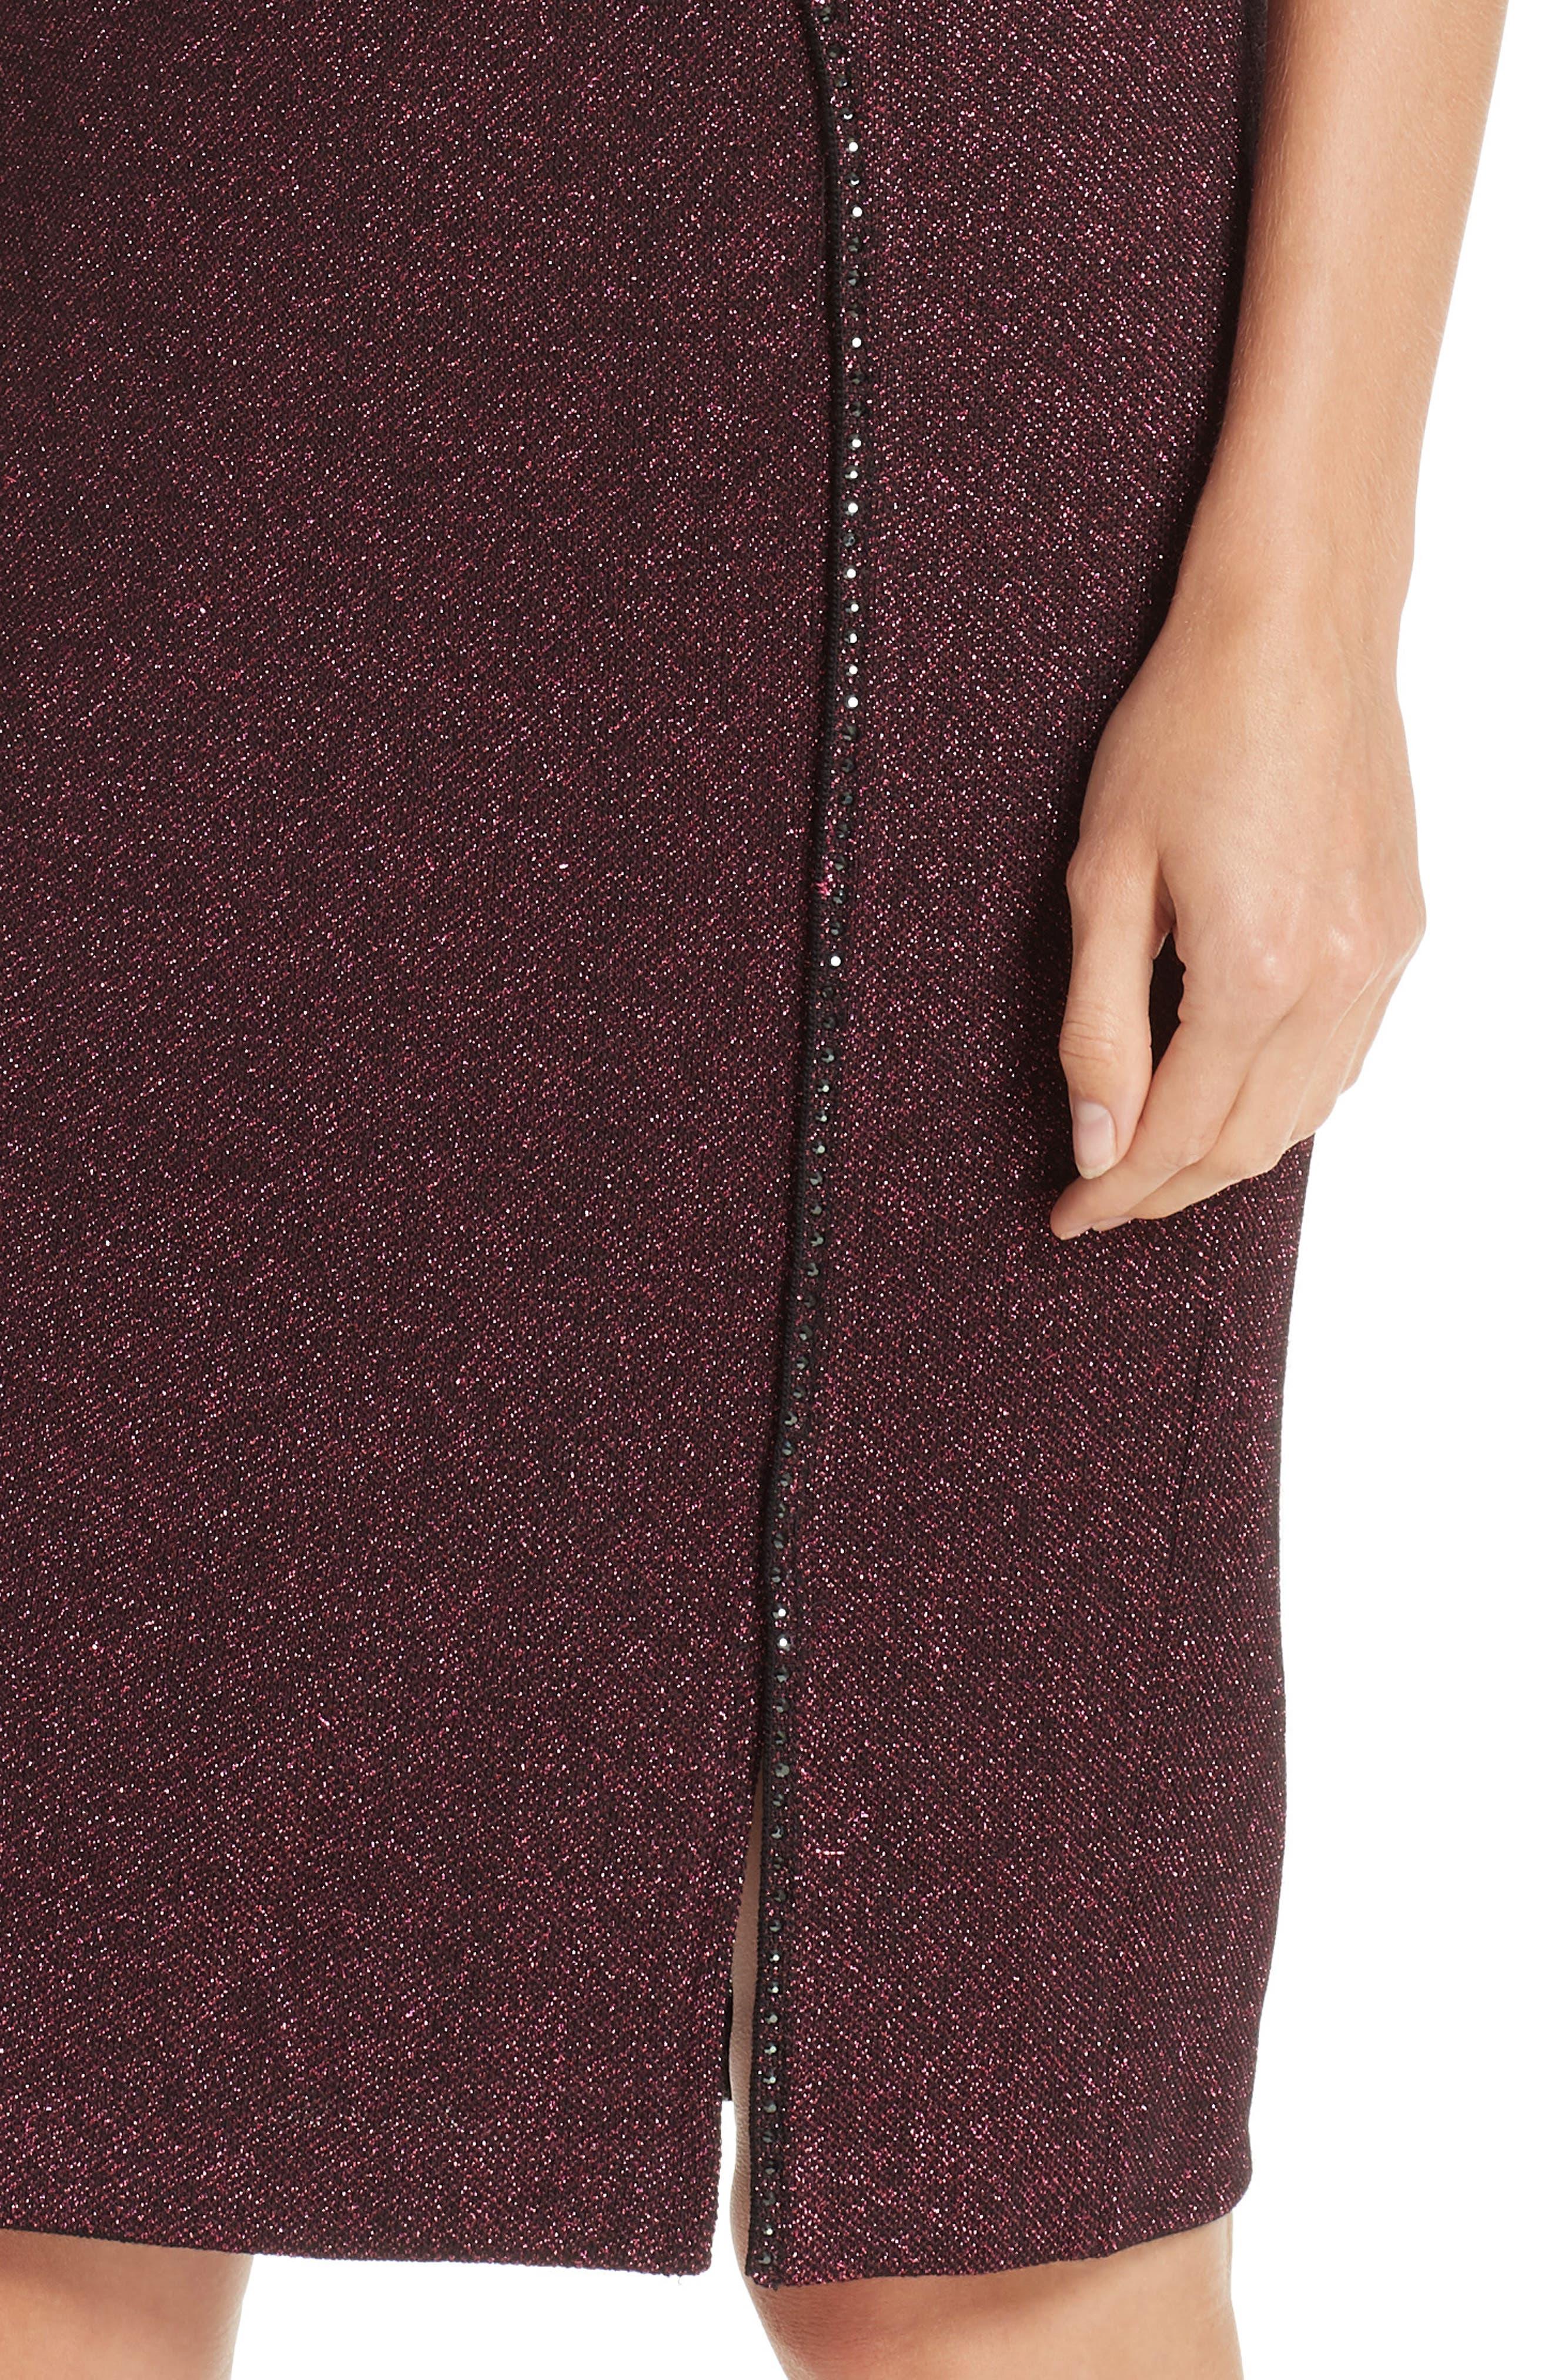 Mod Metallic Knit Sheath Dress,                             Alternate thumbnail 4, color,                             DARK PINK MULTI